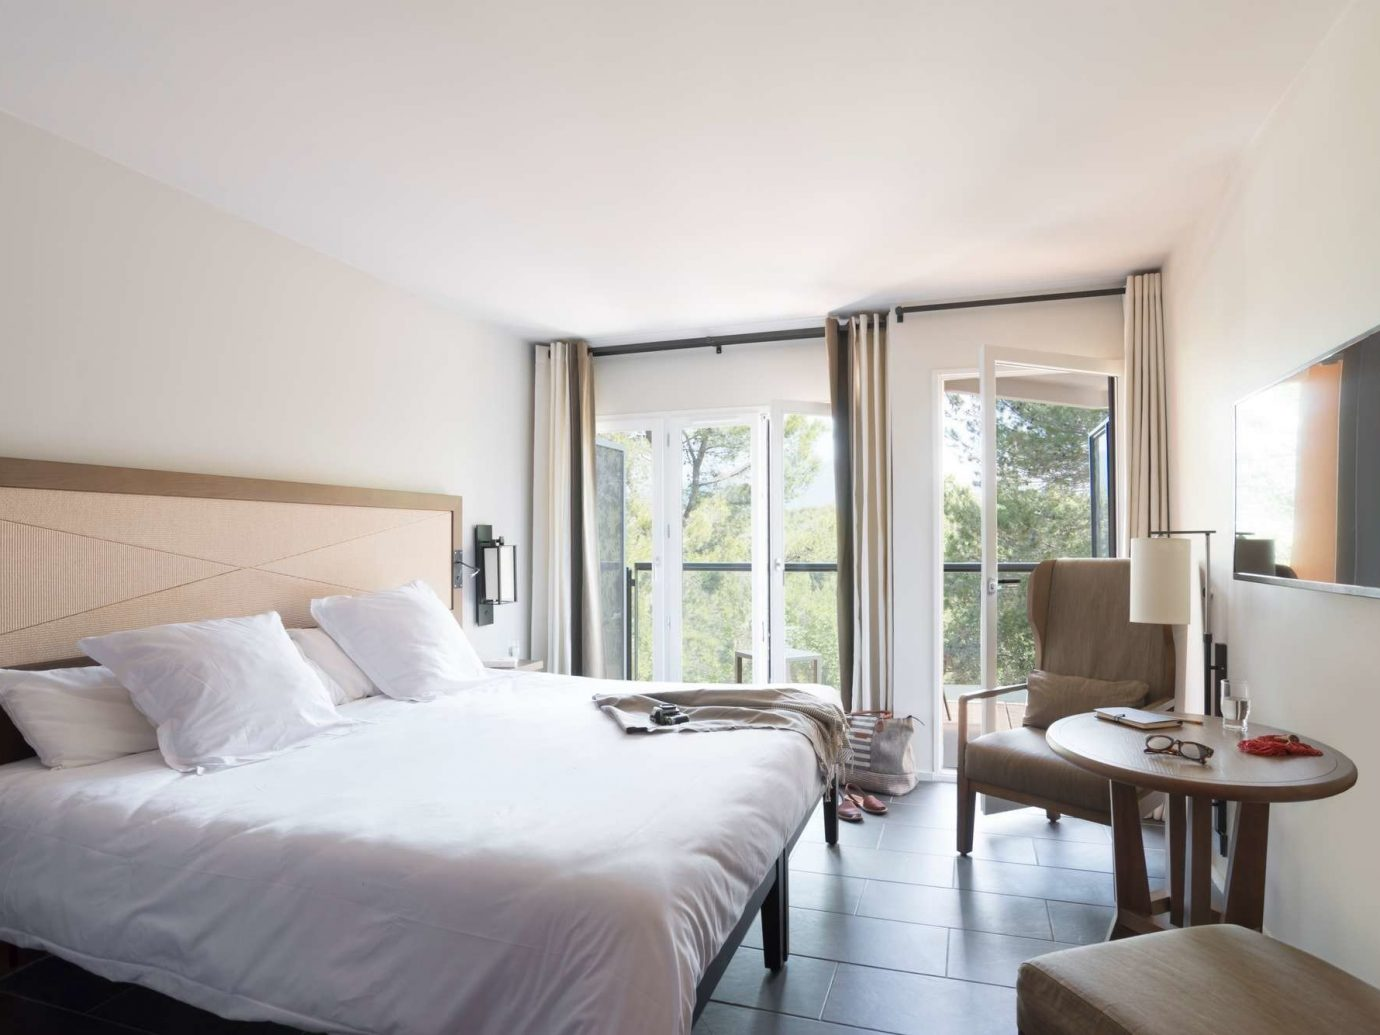 All-Inclusive Resorts Hotels indoor bed wall floor hotel room window ceiling Bedroom Suite interior design real estate white daylighting comfort boarding house interior designer